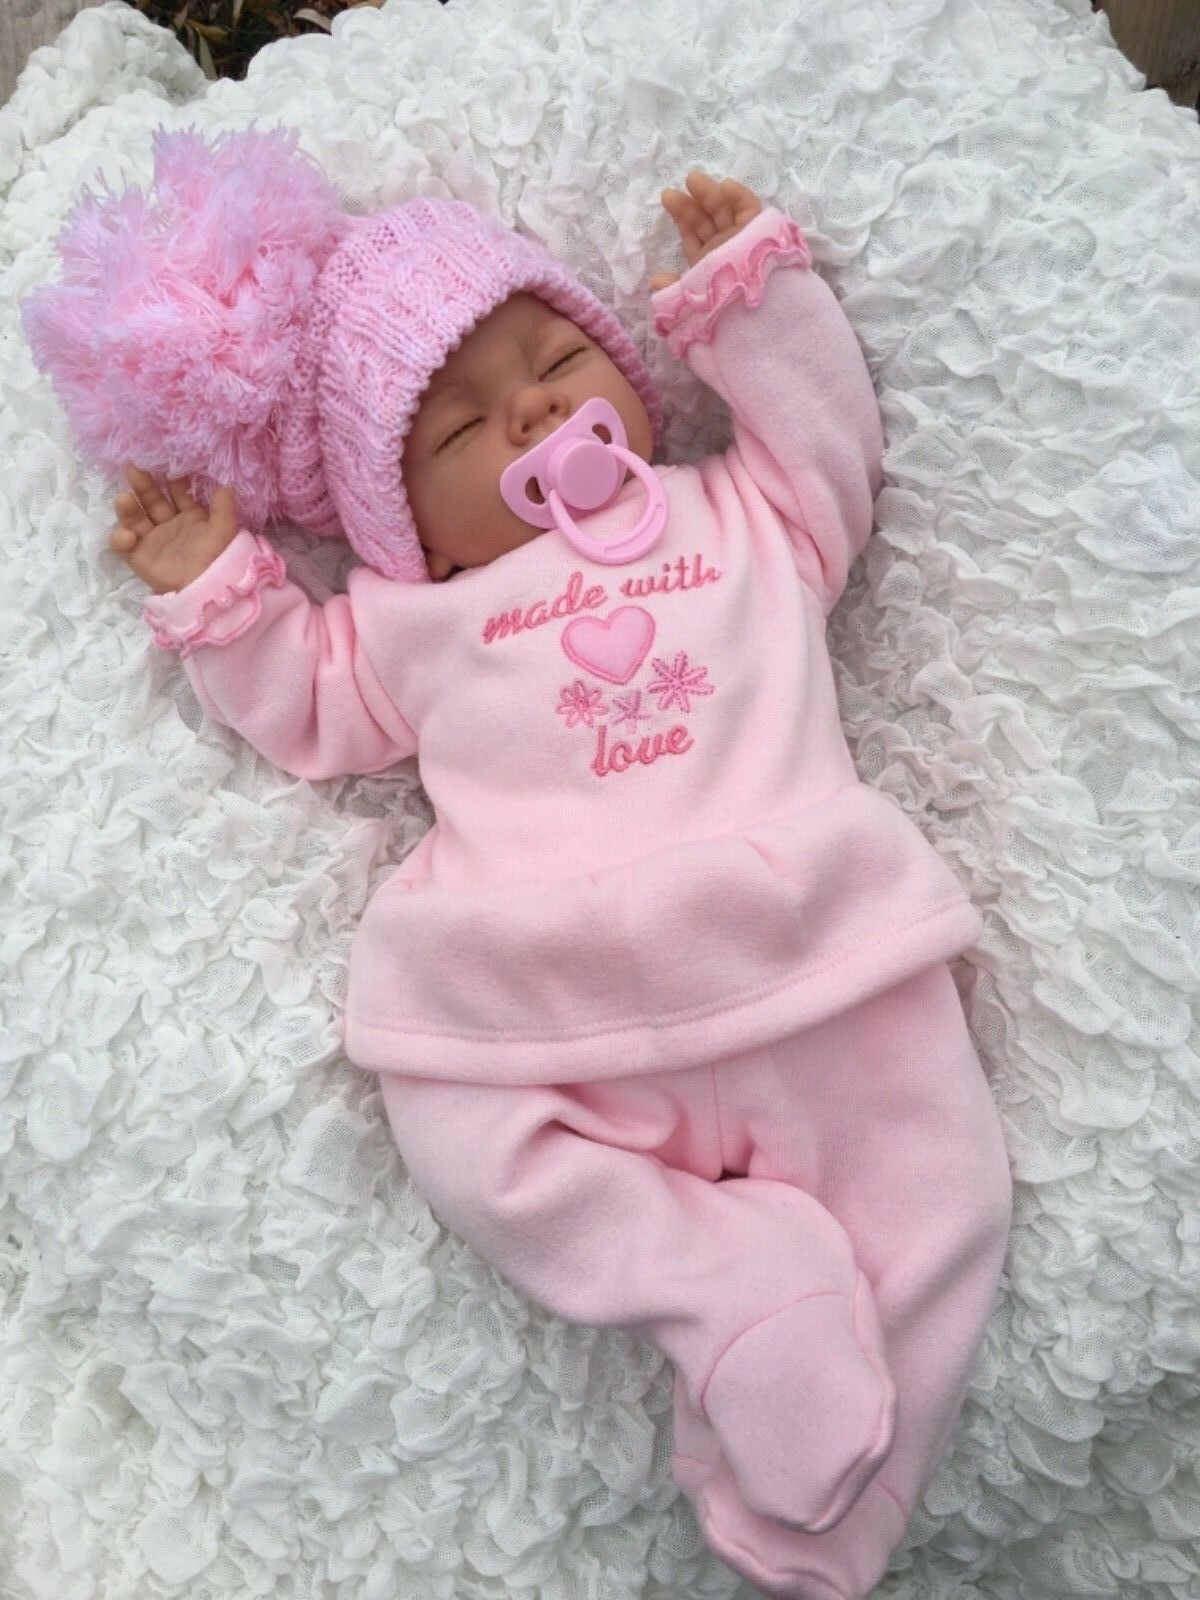 REBORN GIRL VALUE BABY FIRST REBORN SPANISH SET S S S 9cdd45